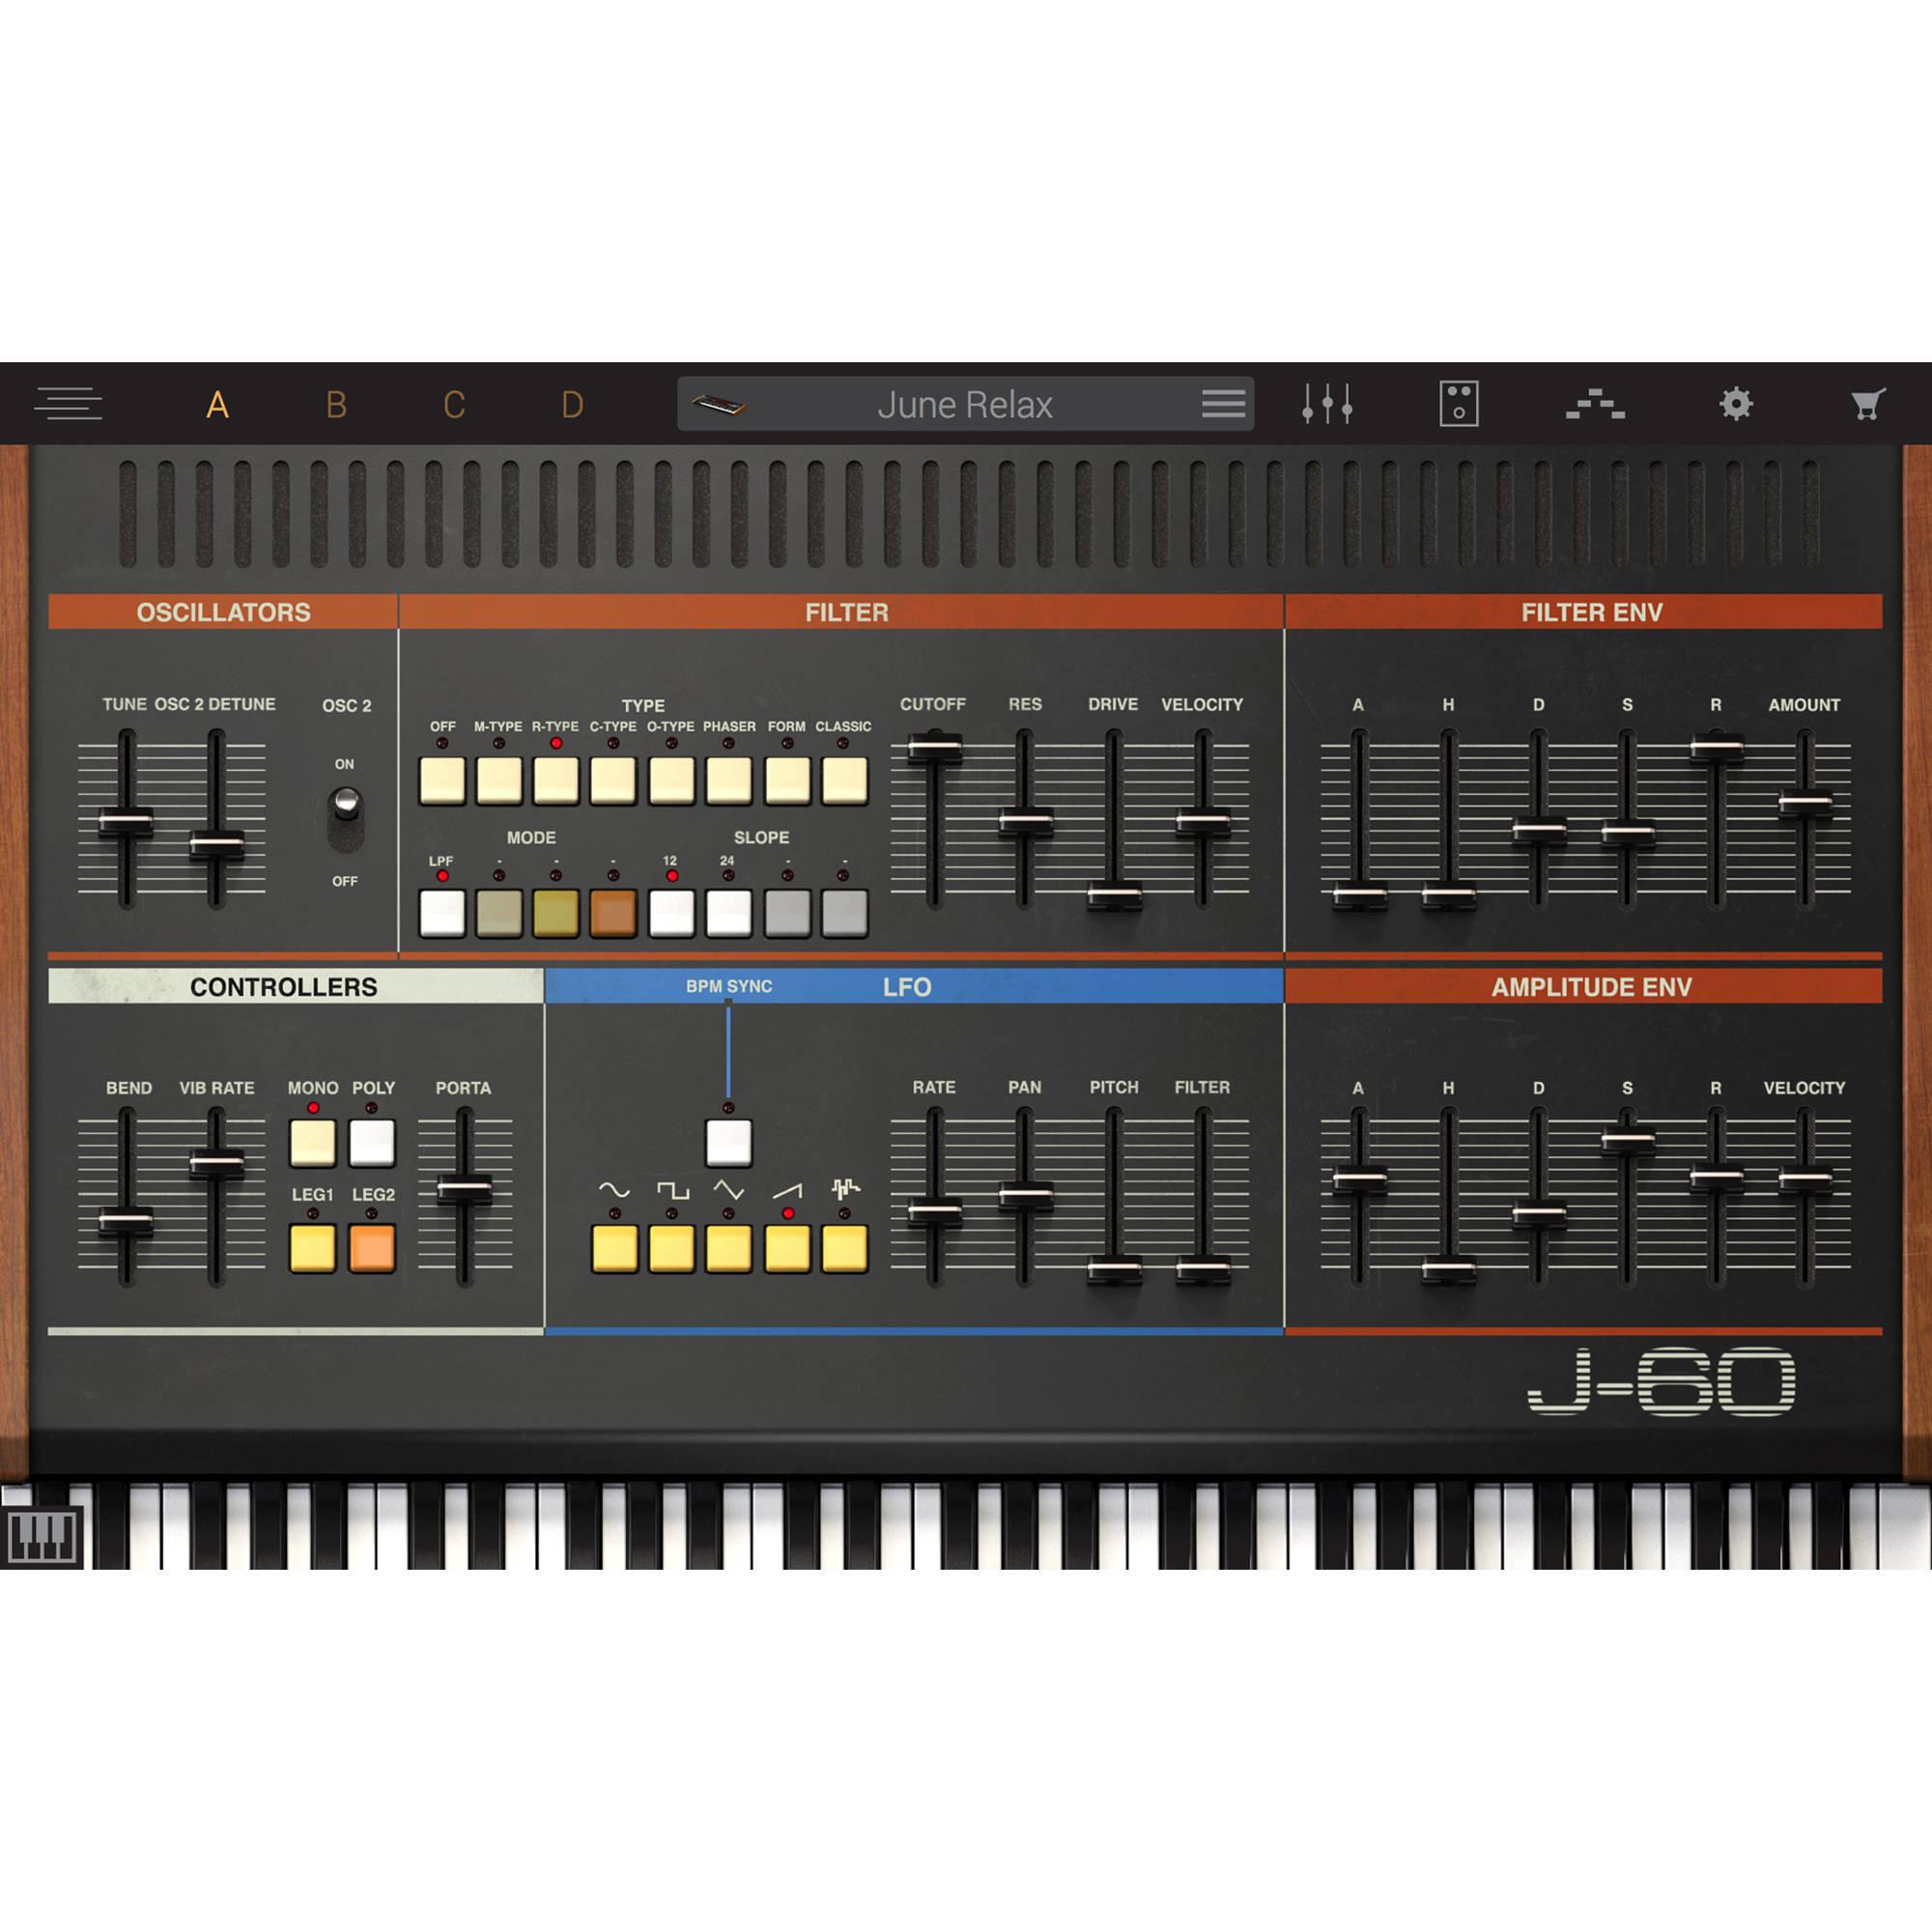 IK Multimedia Syntronik J-60 - Virtual Synthesizer Plug-In (Download)